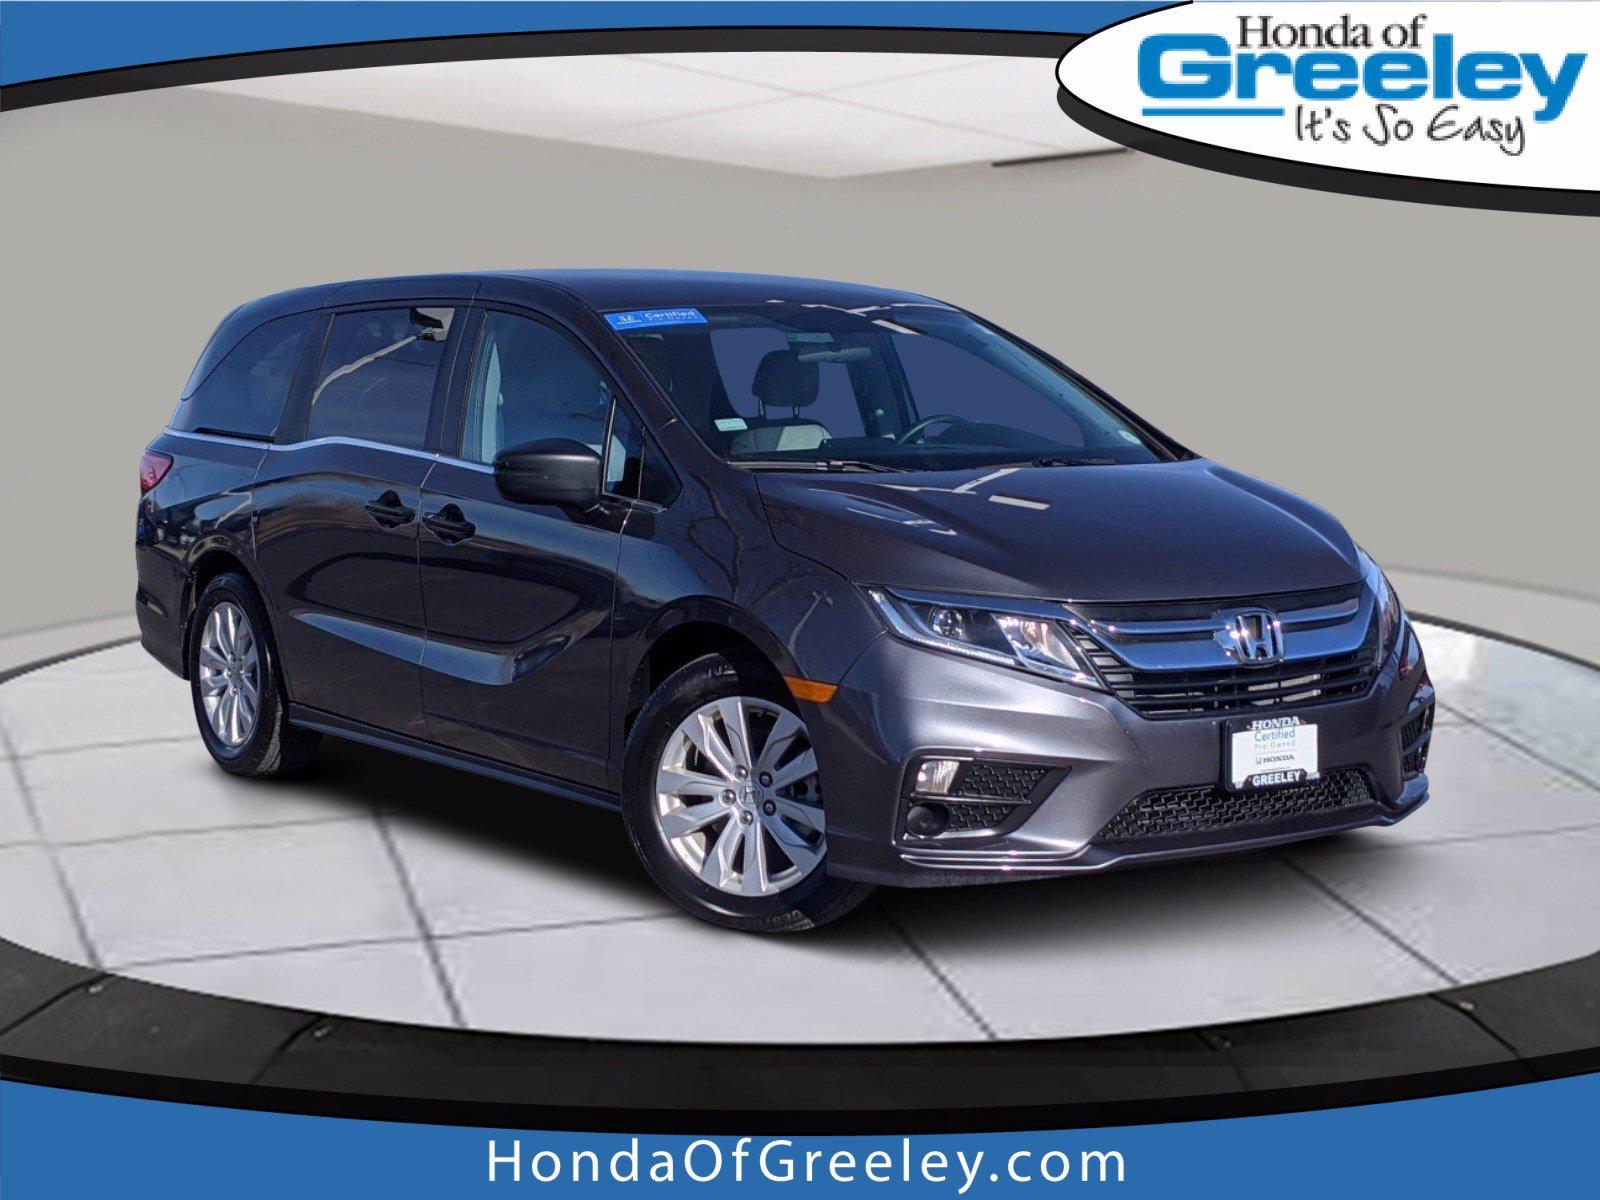 Used 2020 Honda Odyssey For Sale At Honda Of Greeley Vin 5fnrl6h25lb028826